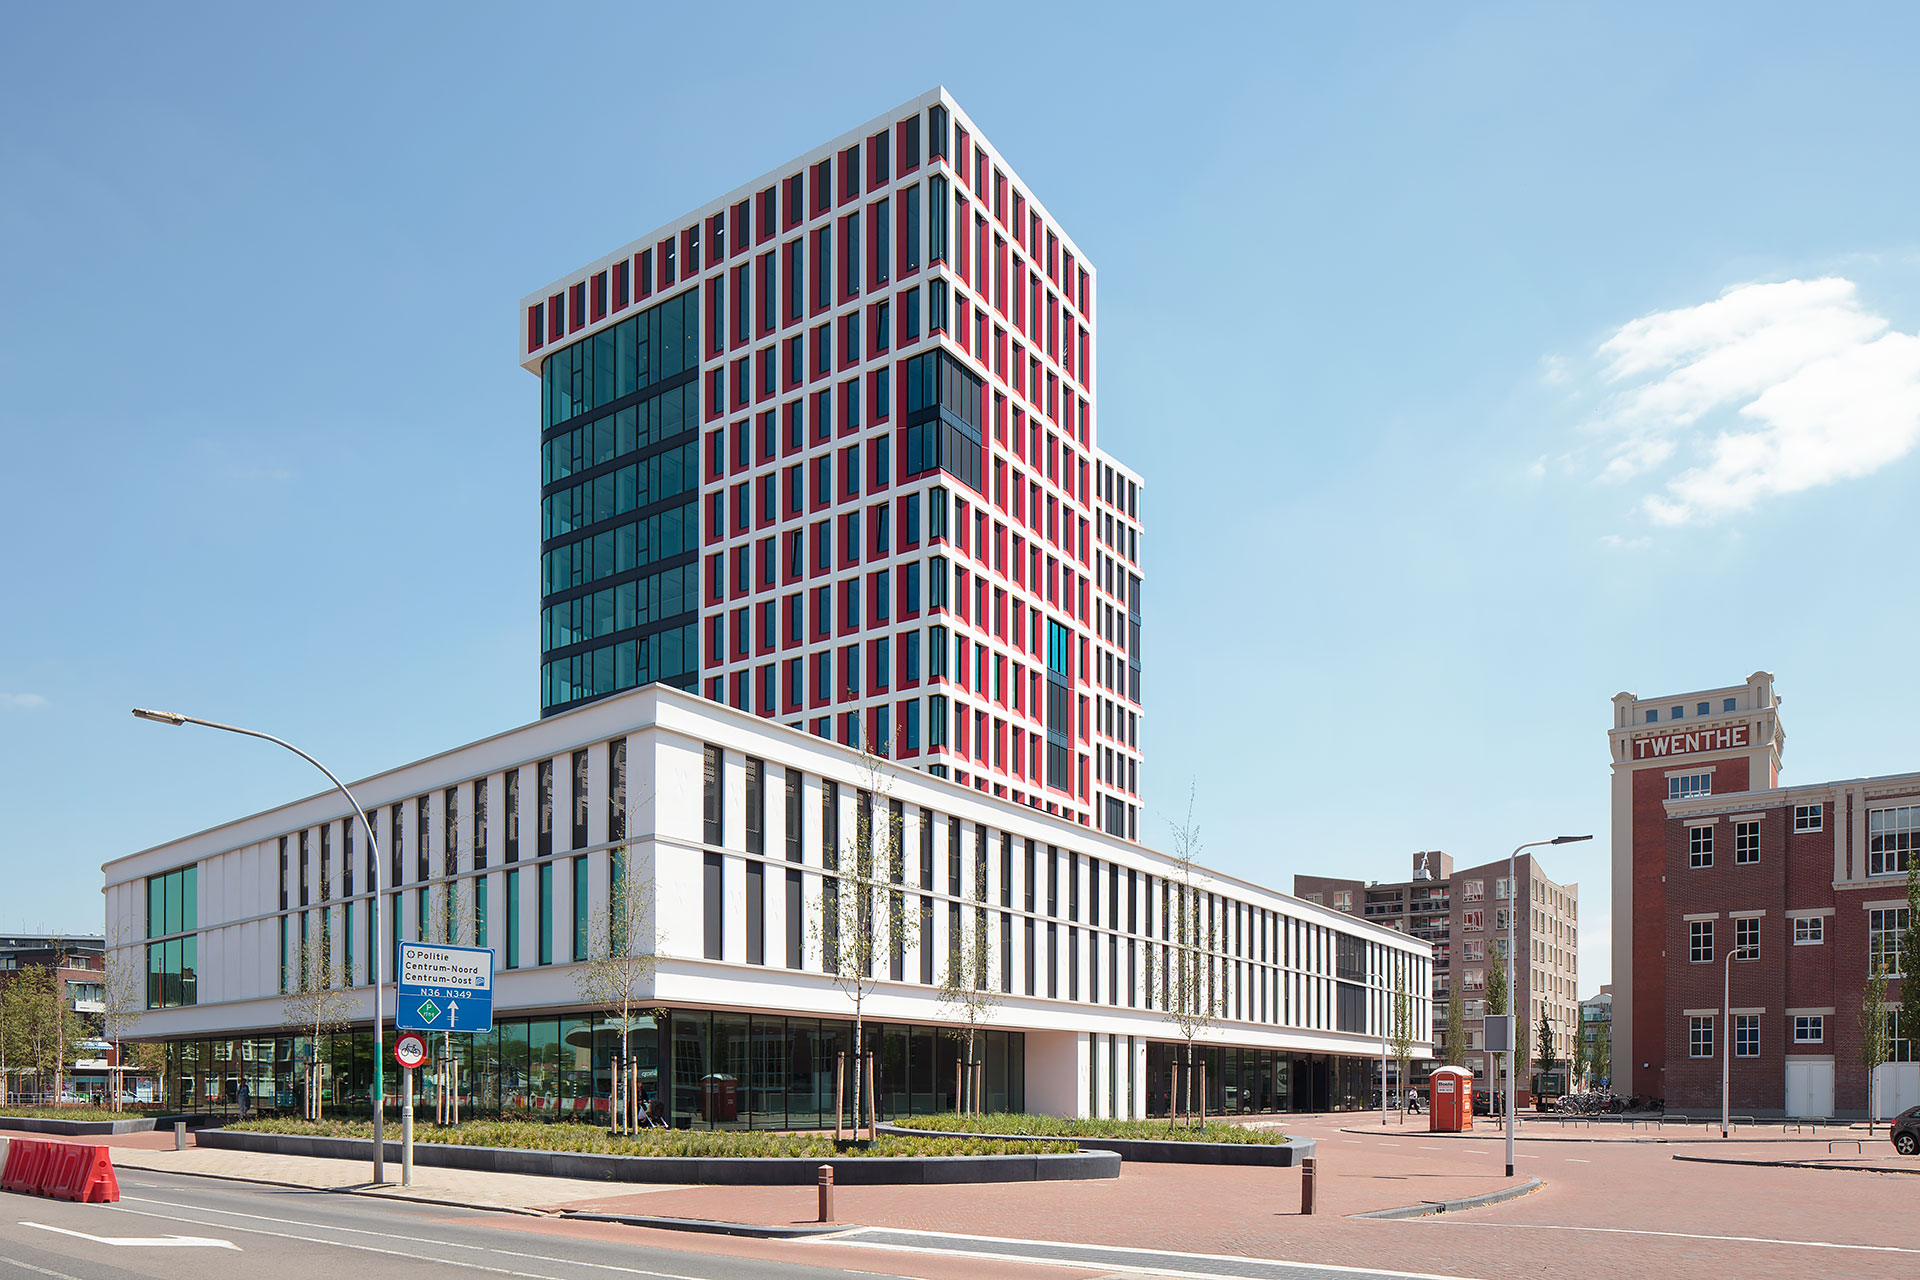 SP2015-Stadhuis-Almelo-architectuurfoto-04